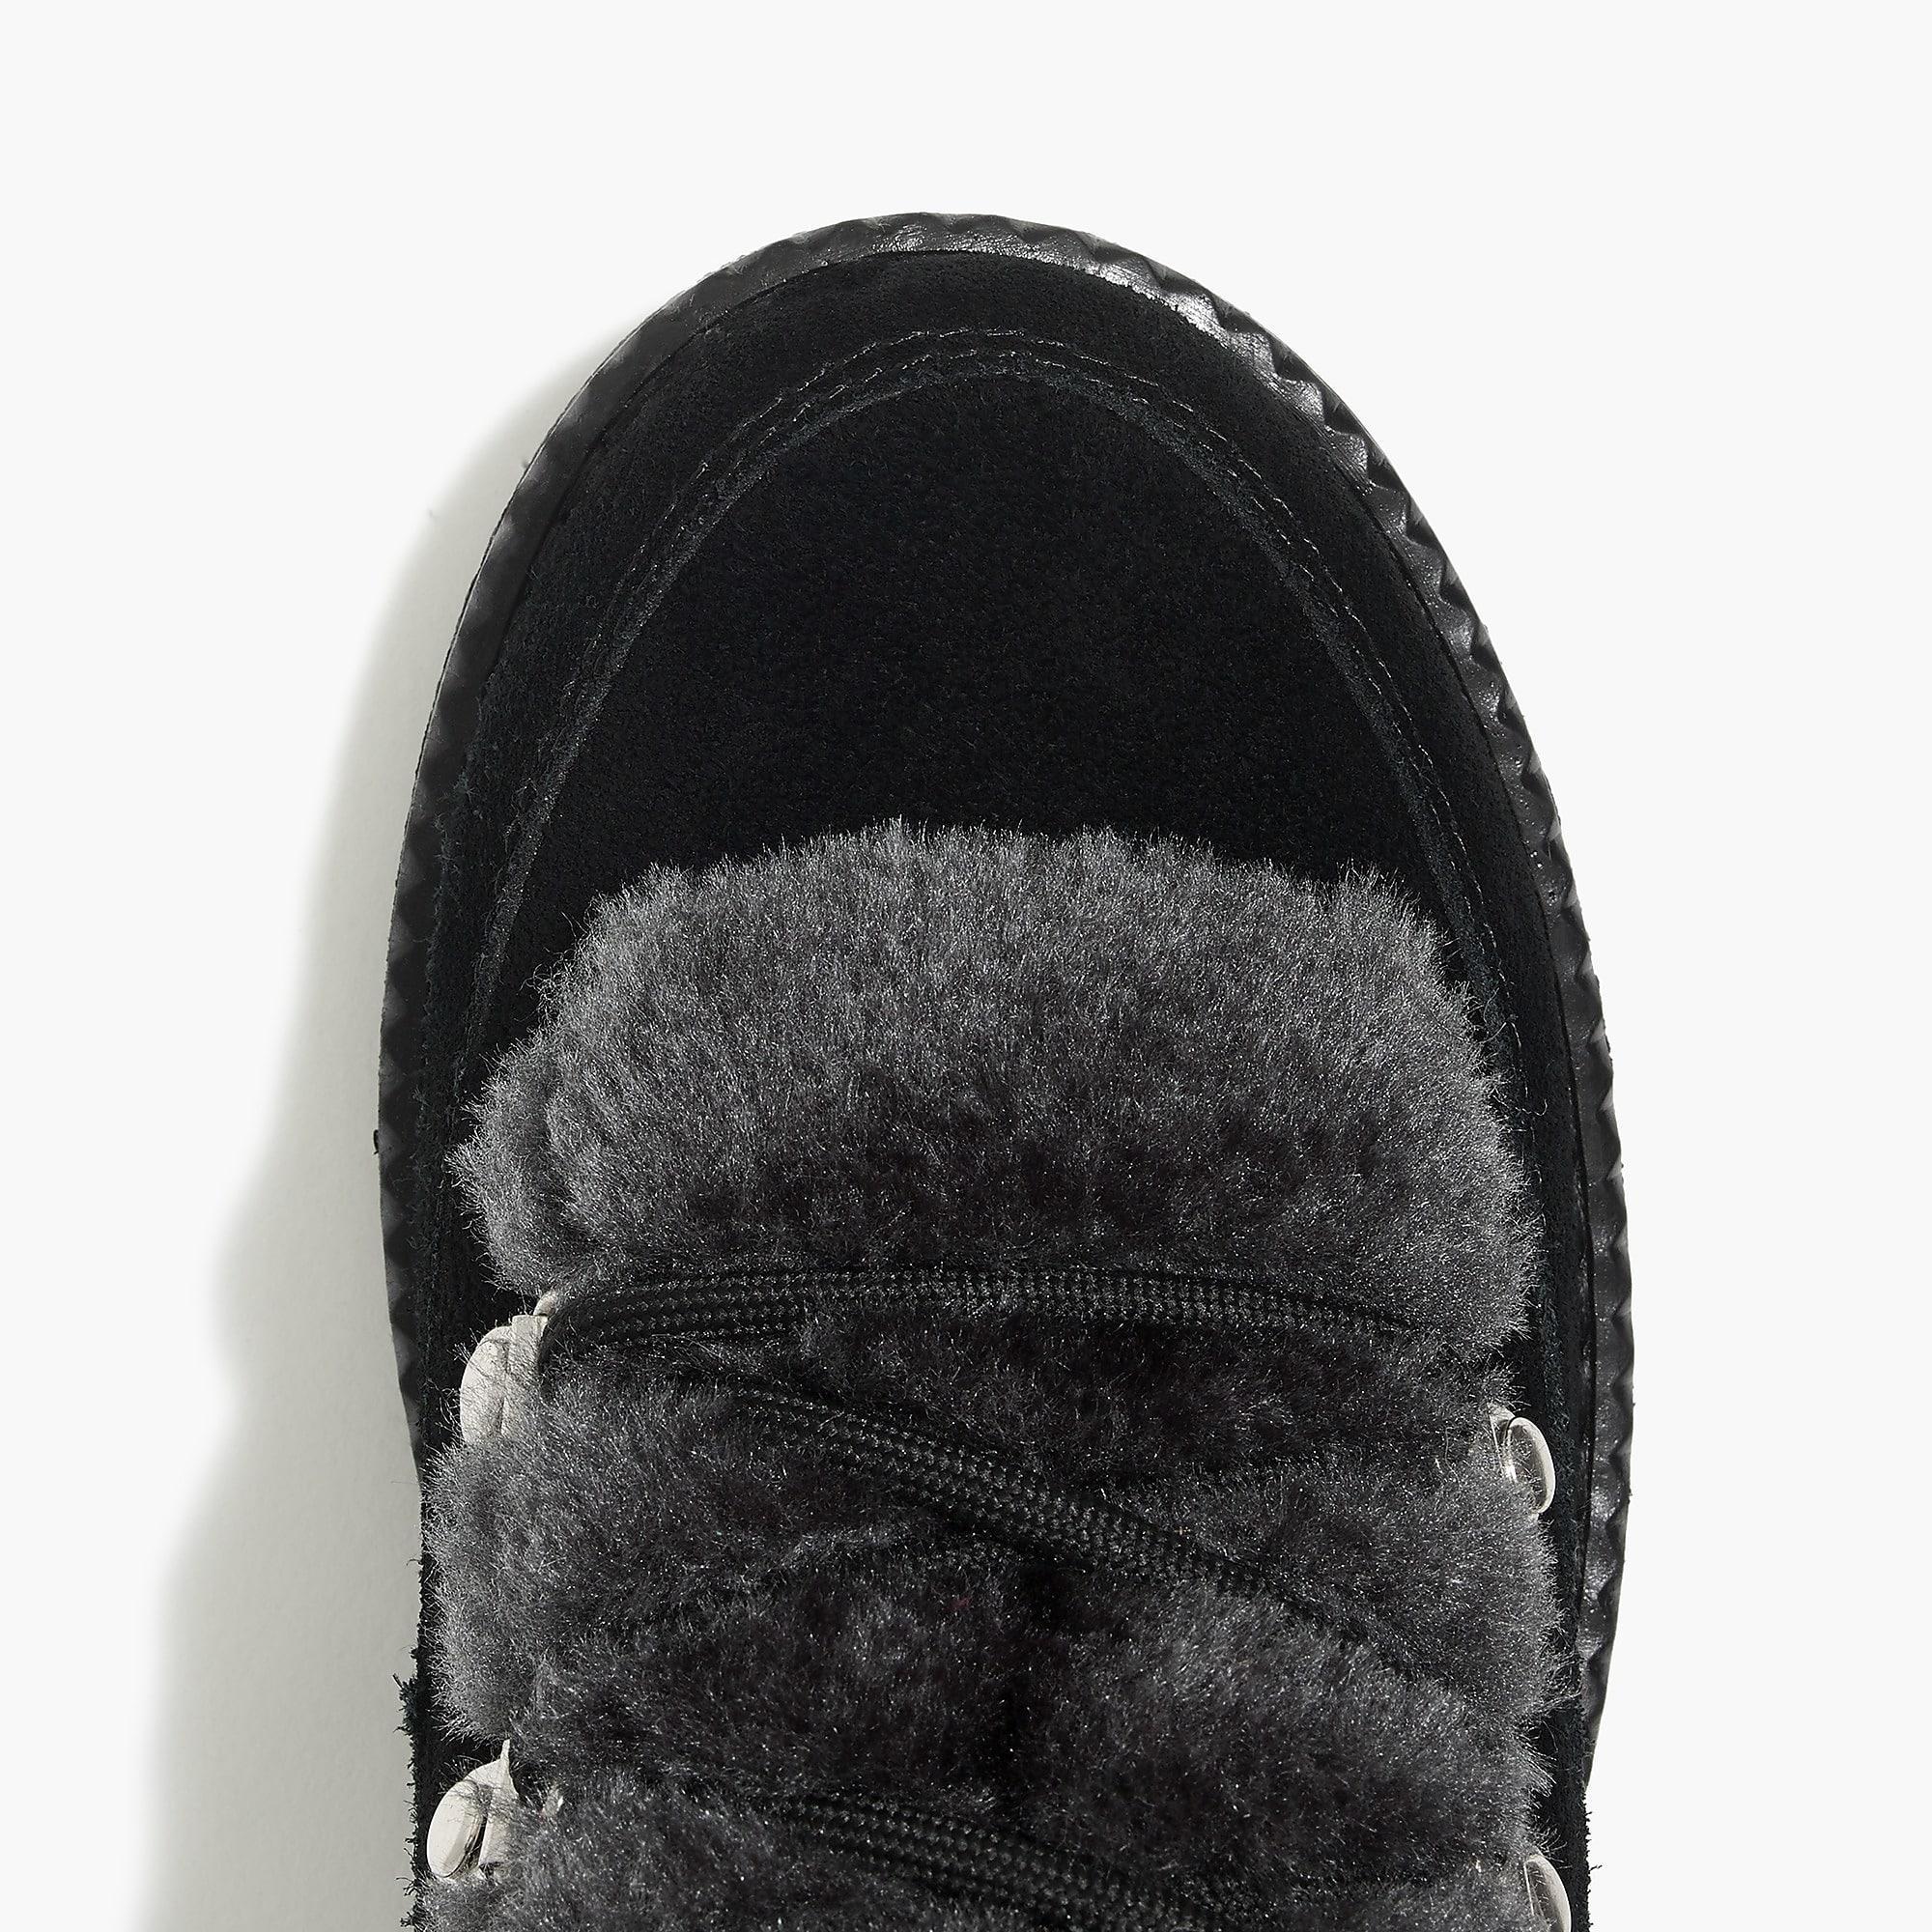 d3f9334357 J.Crew - Black Winter Lace-up Boots - Lyst. View fullscreen